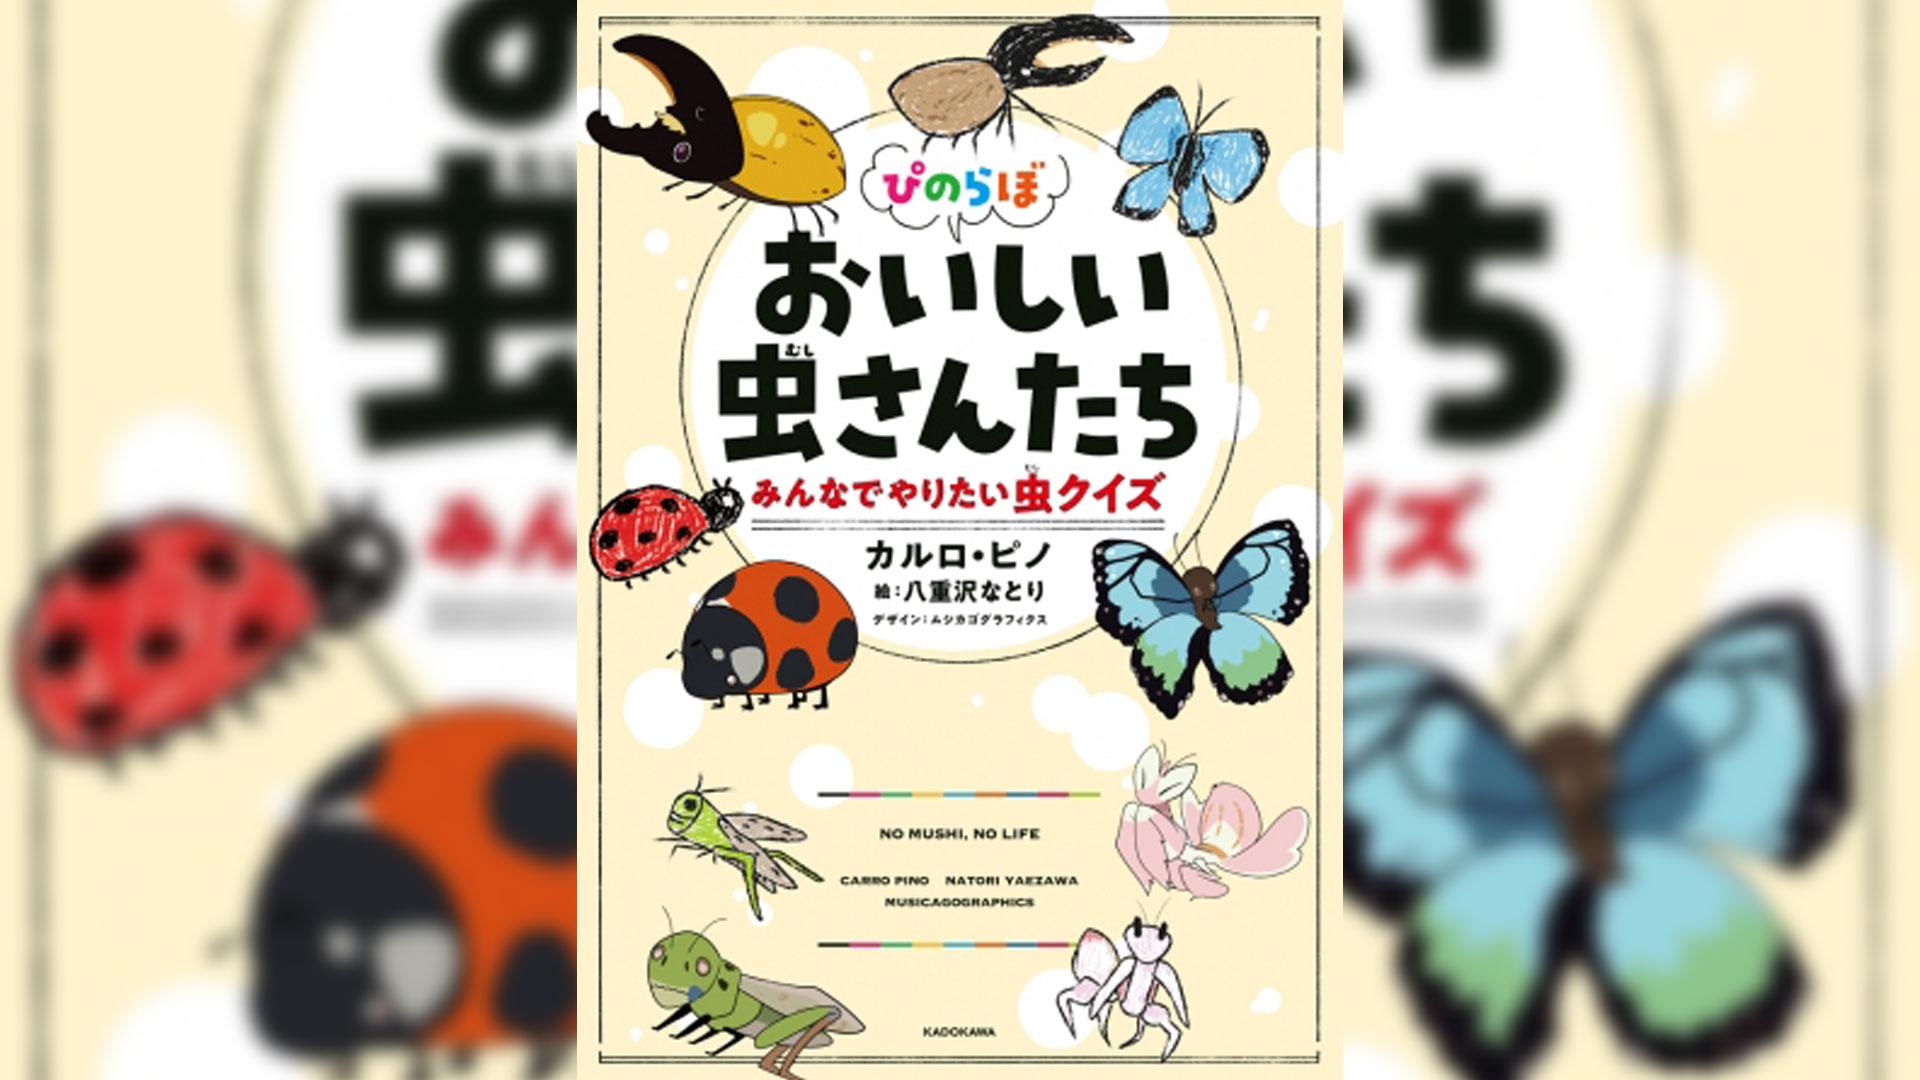 【VTuber史上初「虫の雑学クイズ本」キャンペーン決定】他、新着トレンド3月15日